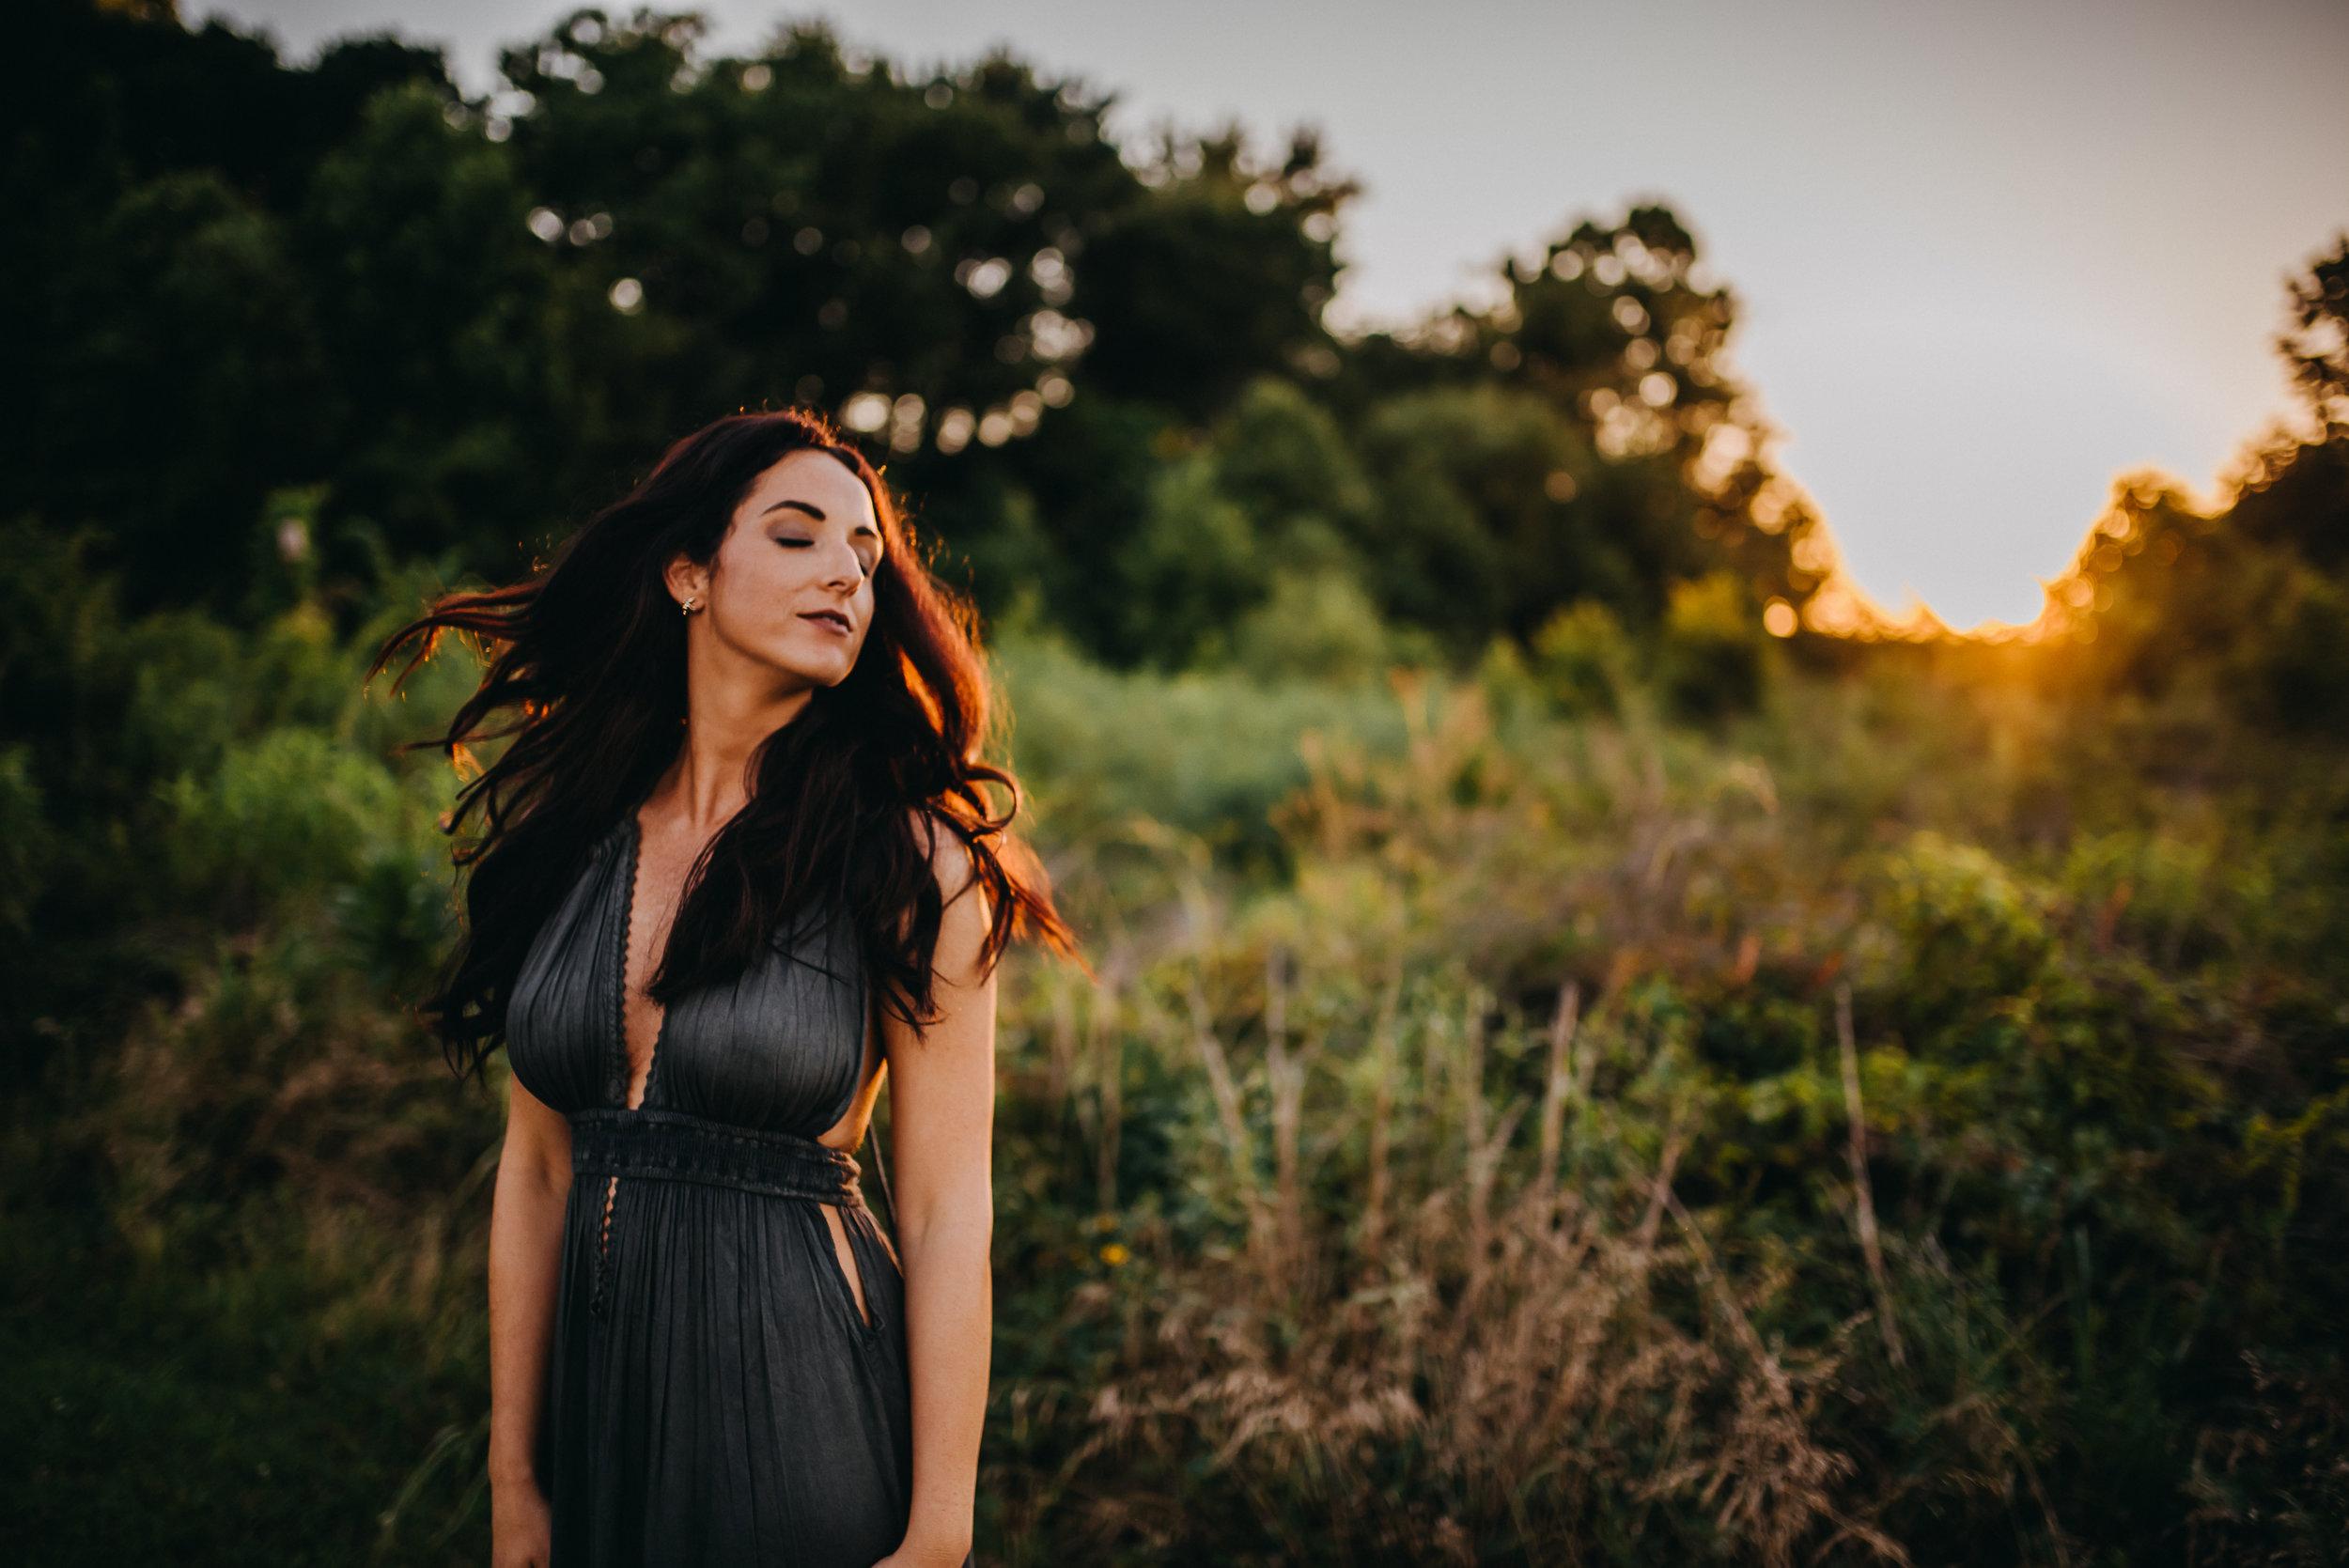 Sunset_Memphis_Ashley_Benham_Photography-67.jpg